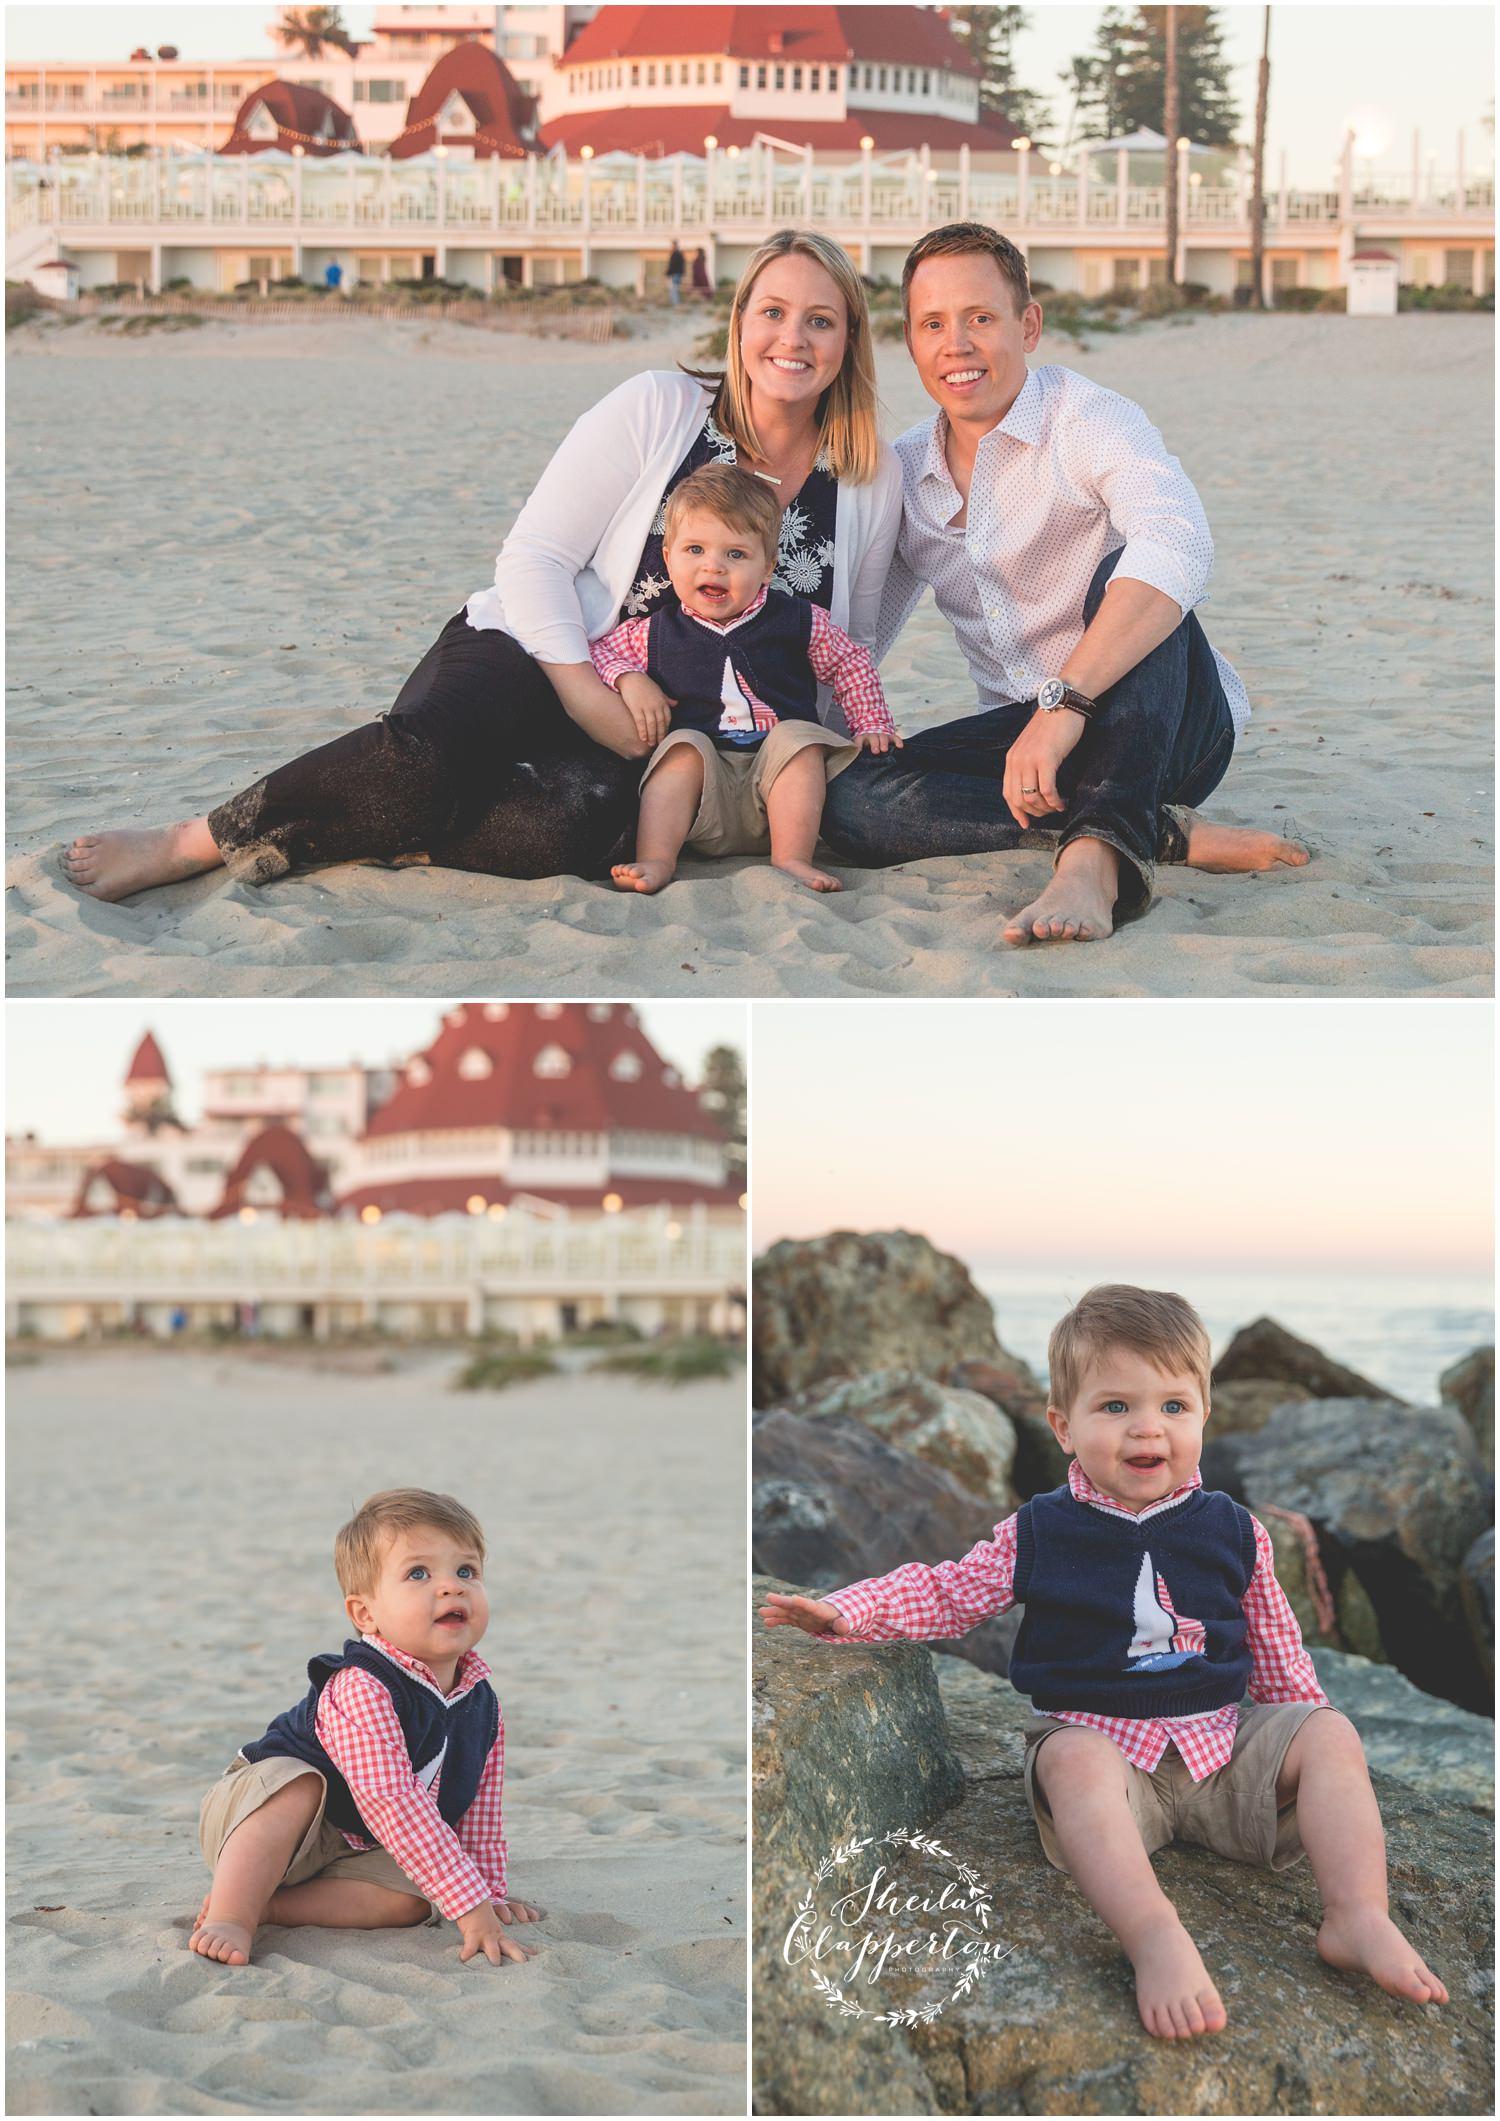 coronado beach family photo